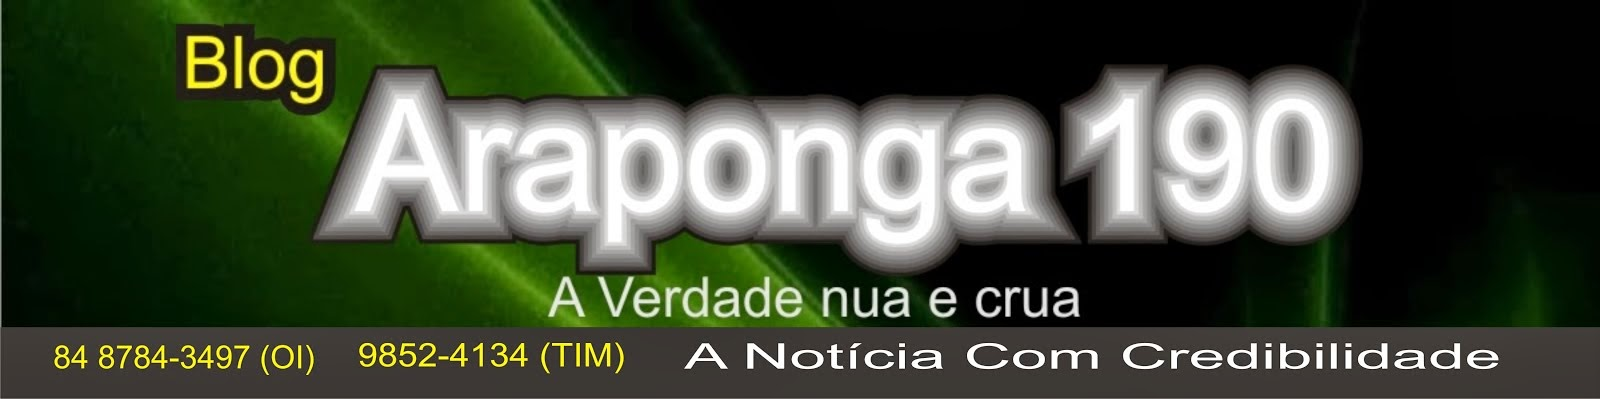 Araponga 190